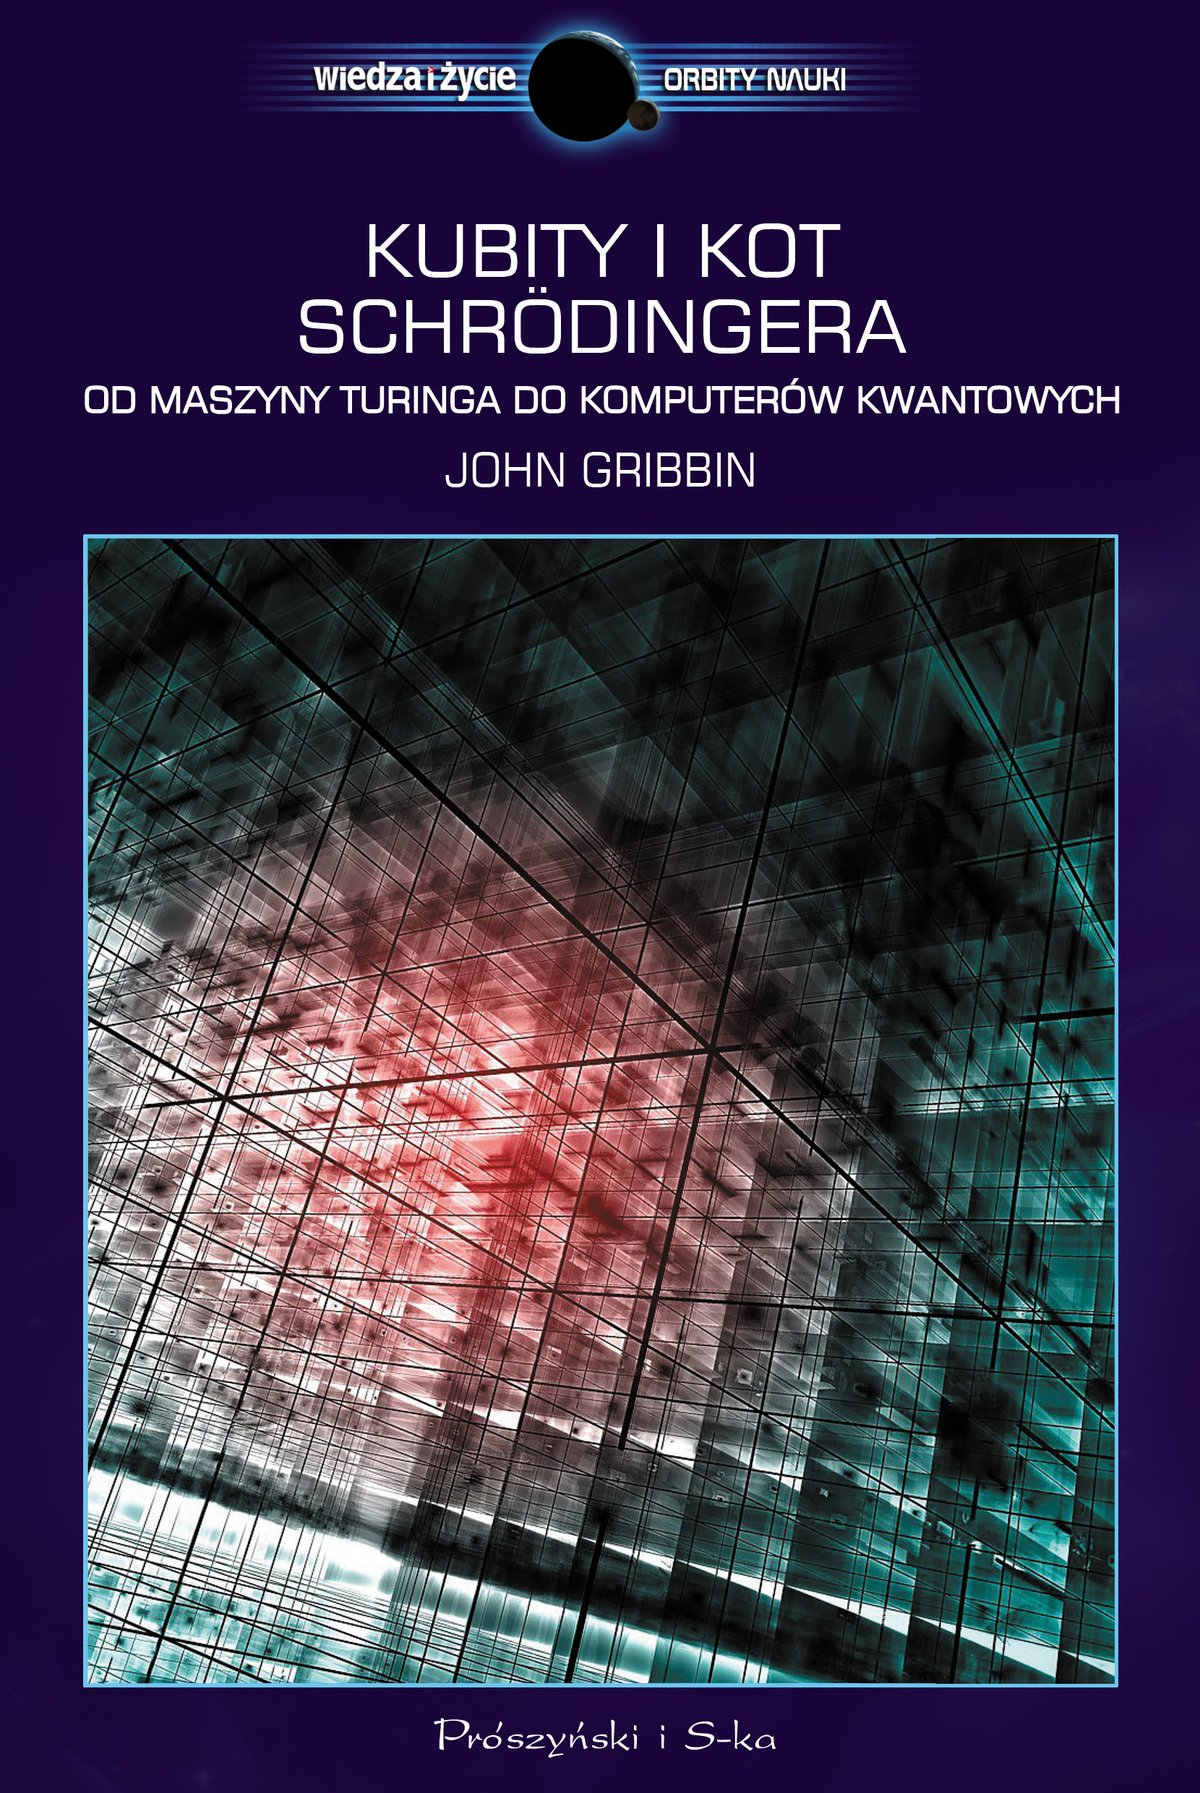 Kubity i kot Schrödingera - Ebook (Książka na Kindle) do pobrania w formacie MOBI